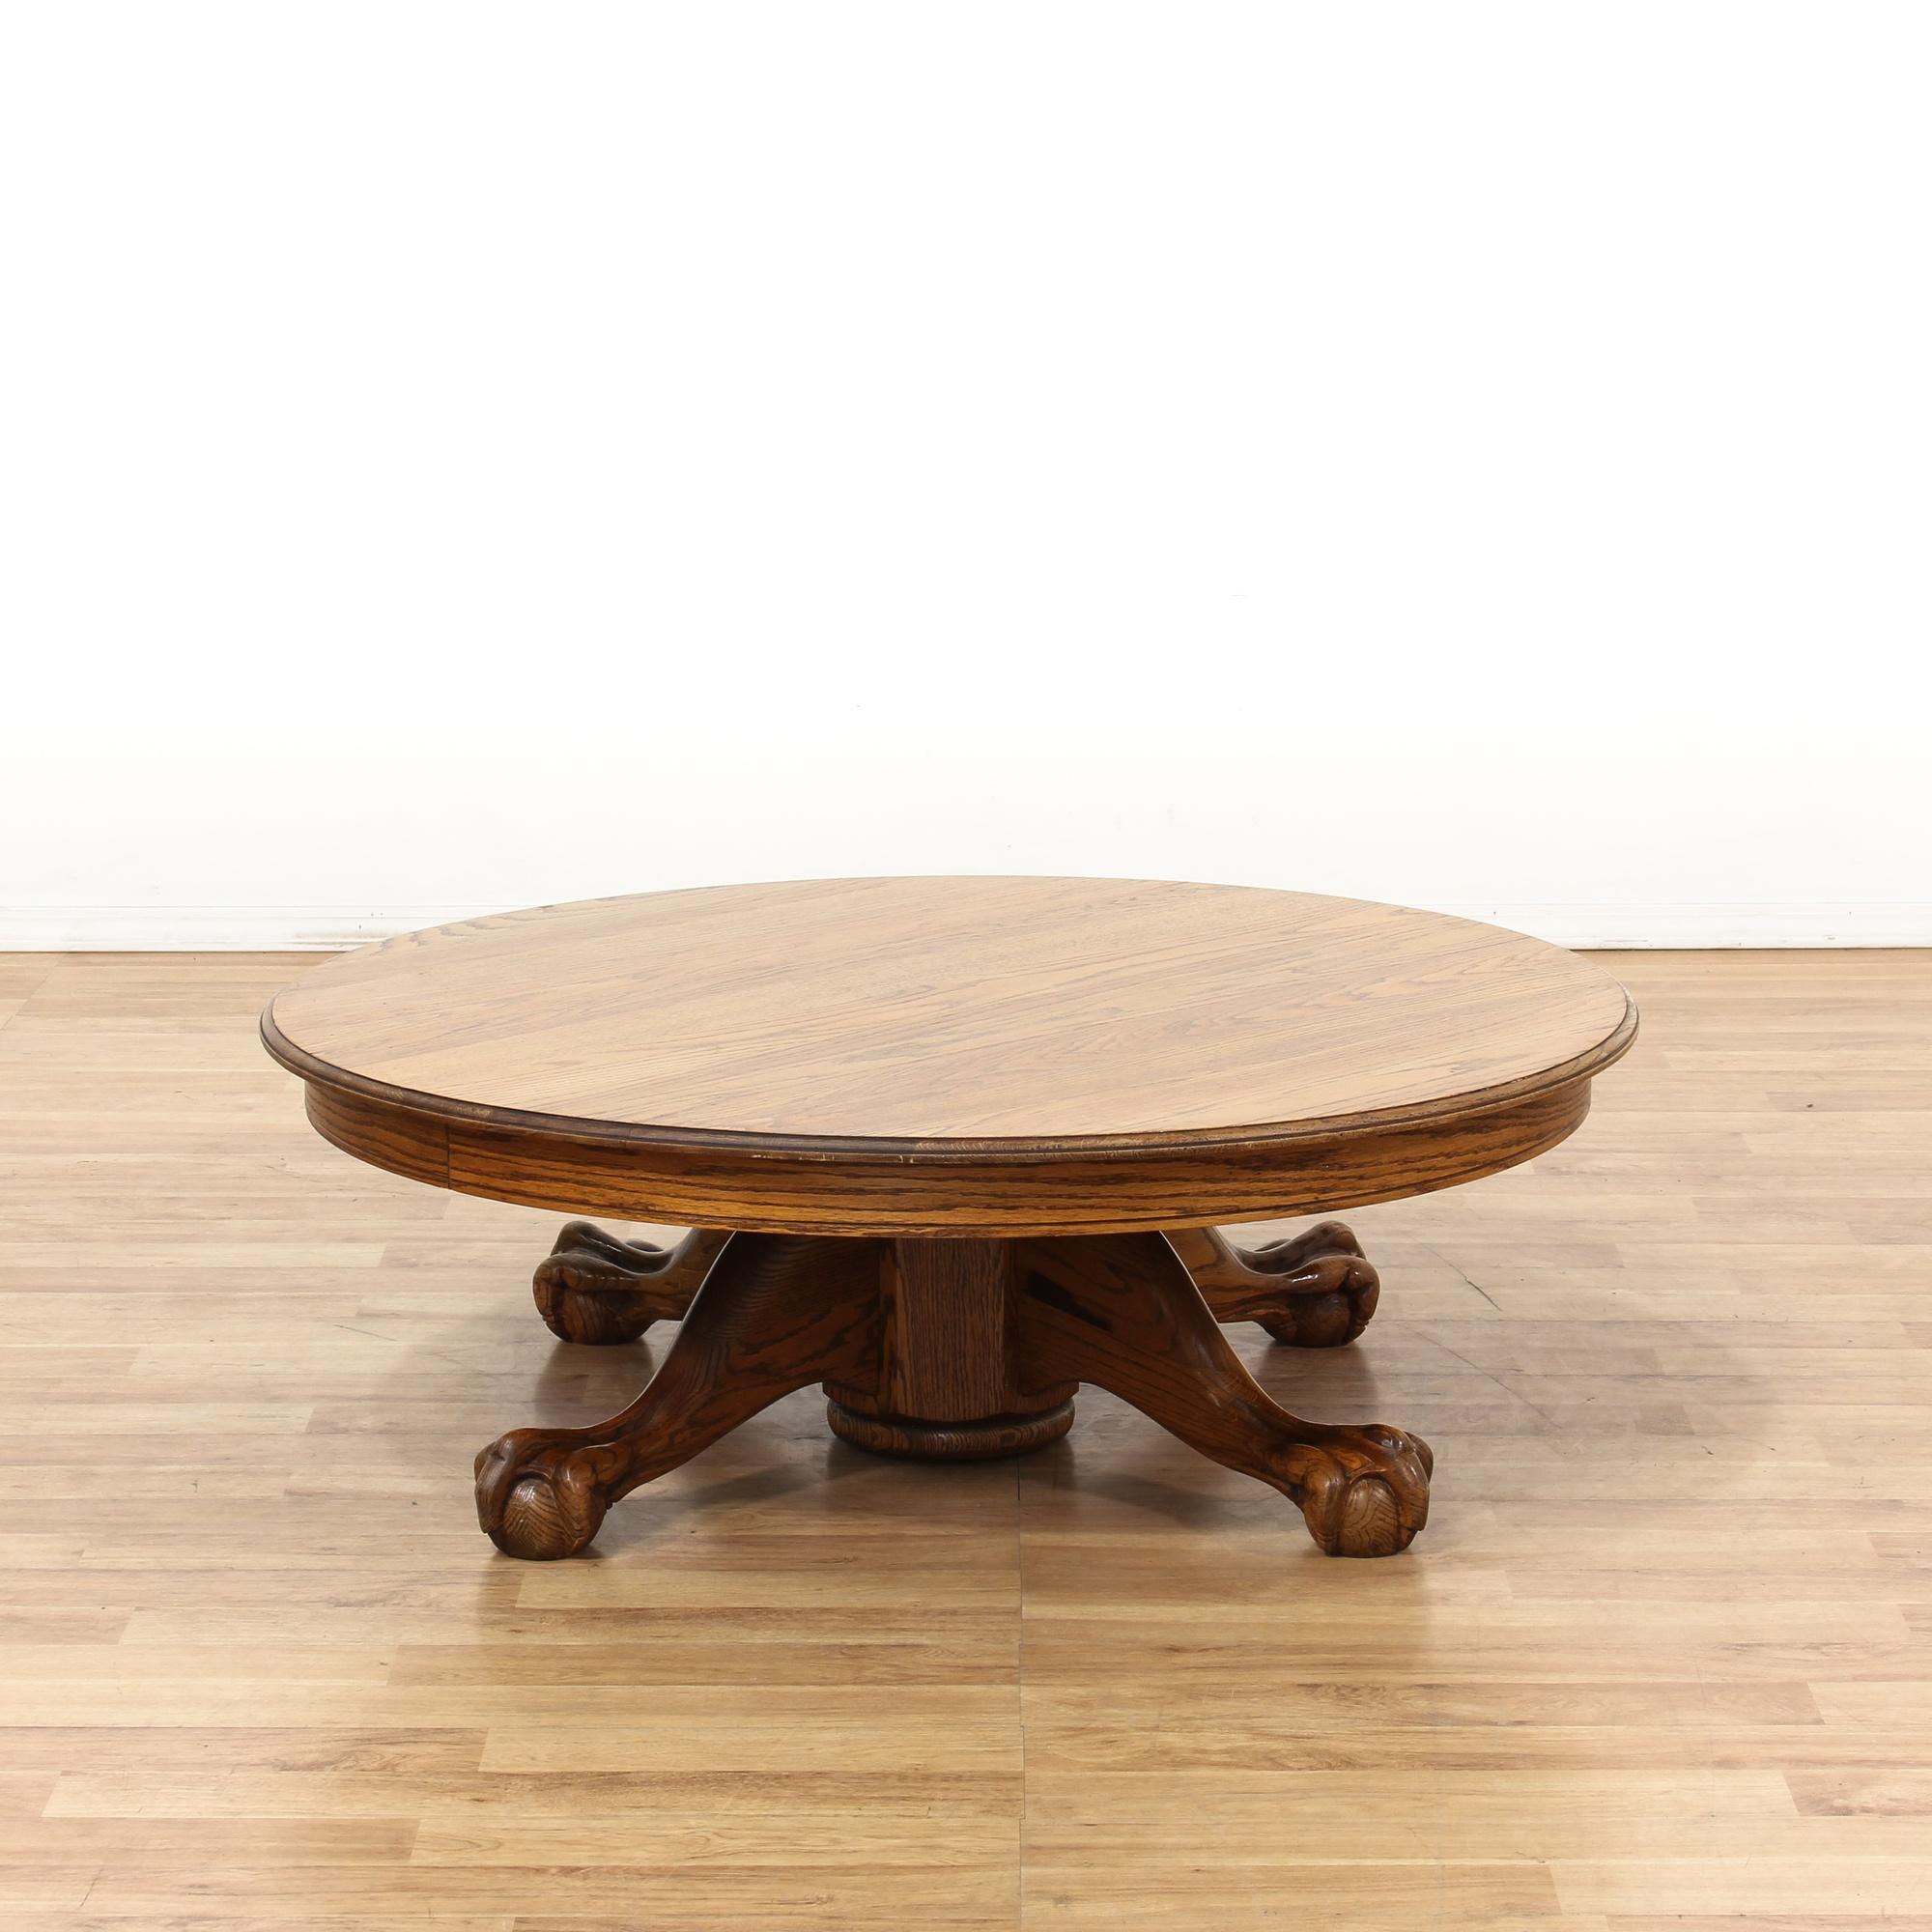 Round Oak Claw U0026 Ball Foot Coffee Table | Loveseat Vintage Furniture Los  Angeles